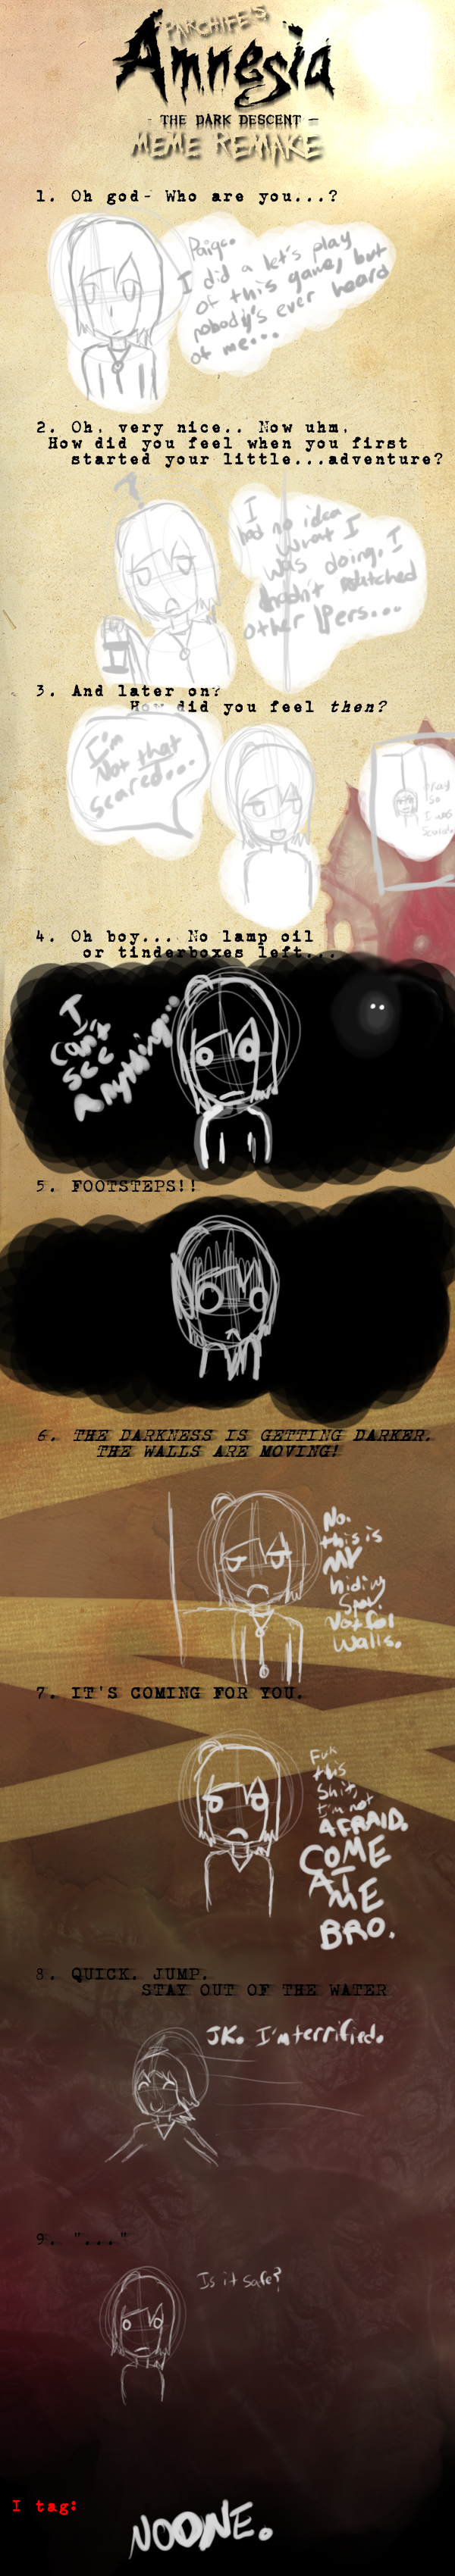 Amnesia the dark descent meme